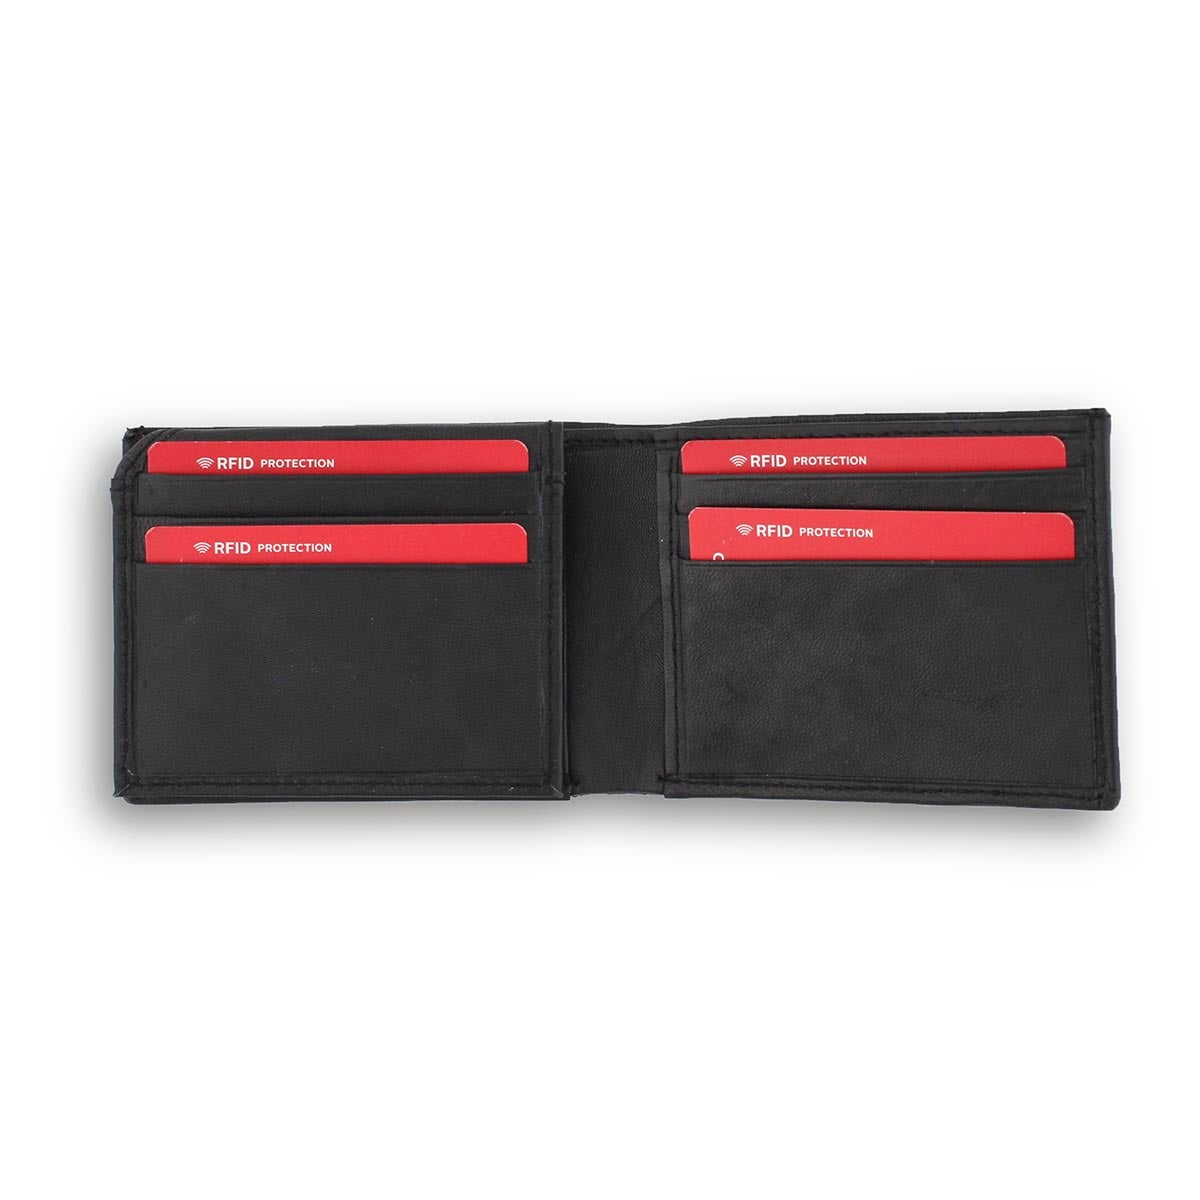 Mns black genuine leather RFID wallet